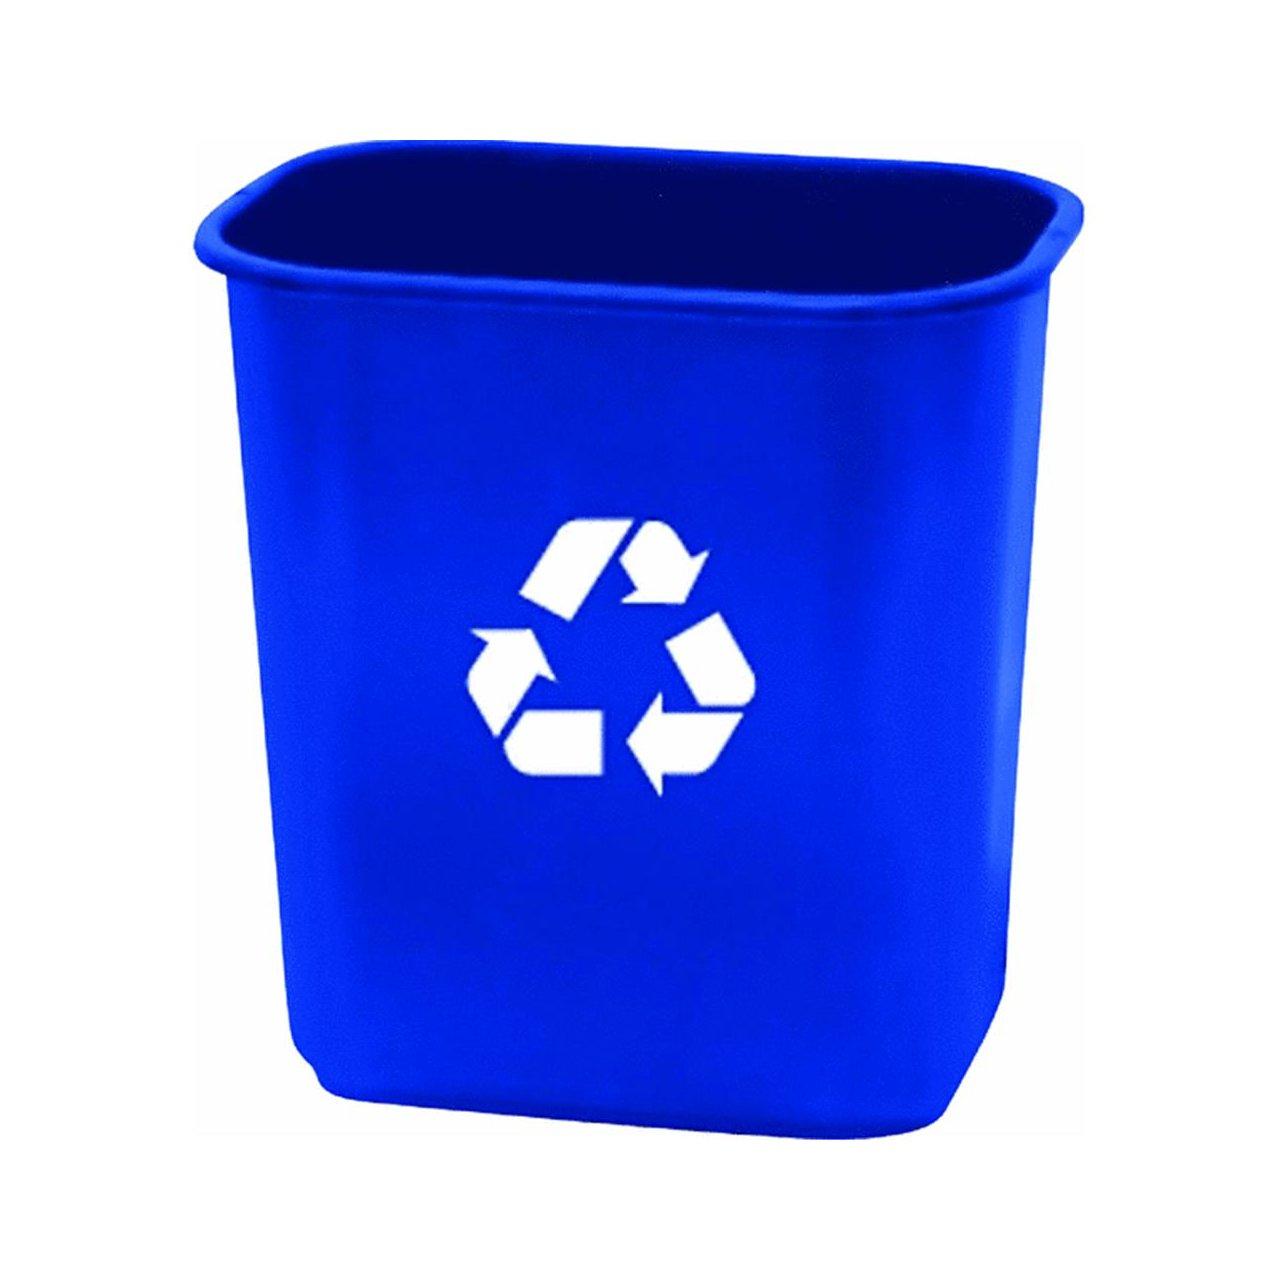 United Solutions EcoSense WB0084 Blue Twenty Eight Quart Recycling  Wastebasket   28QT Recycling Bin In Blue